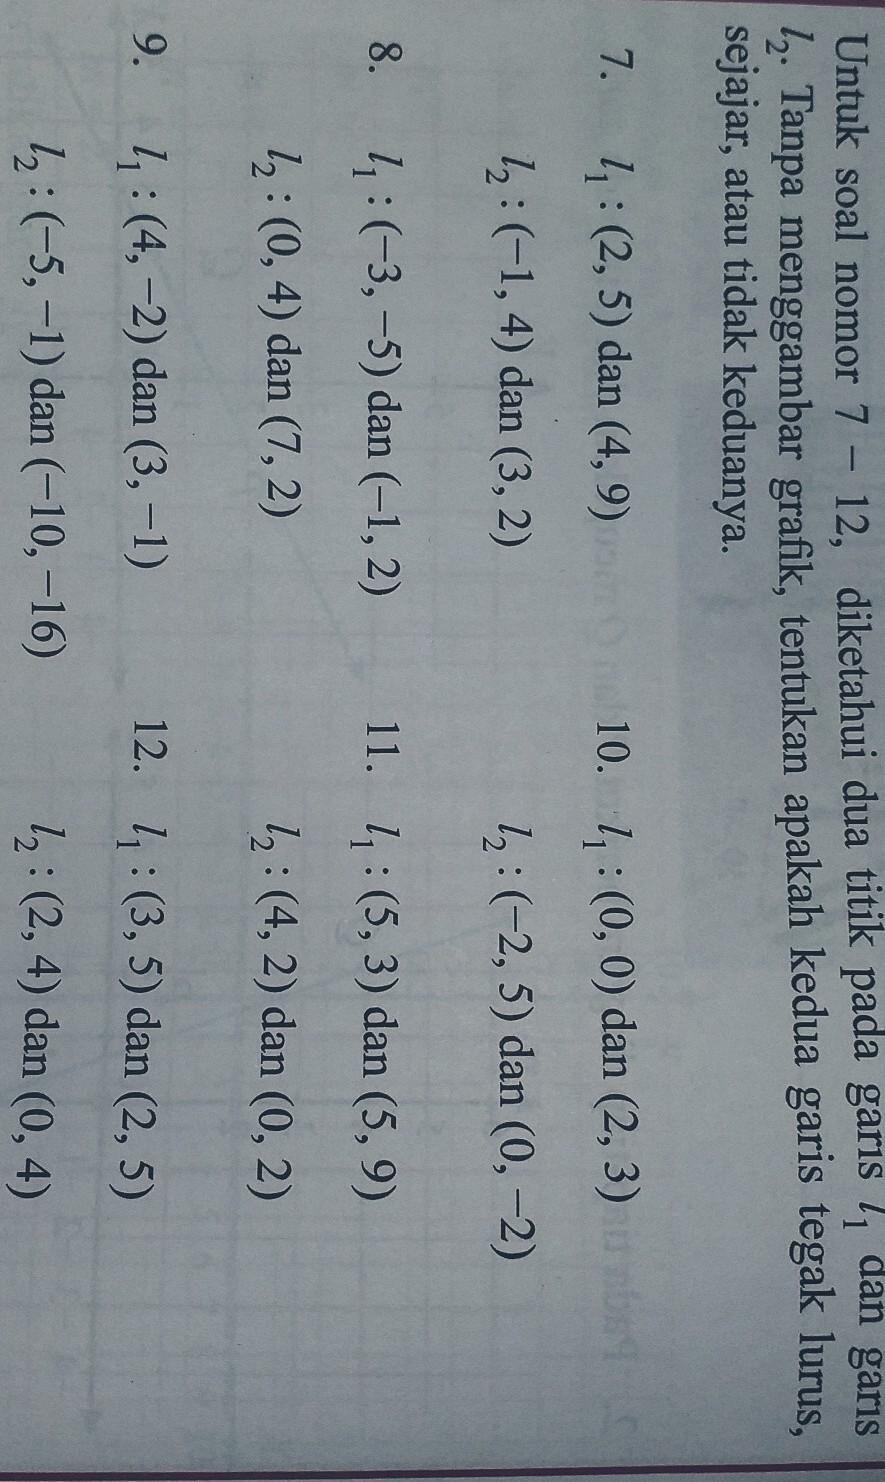 Matematika Kls 8 Uji Kompetensi 4 3 Hal 158 No 7 12tolong Bantu Jawab Yaa Brainly Co Id